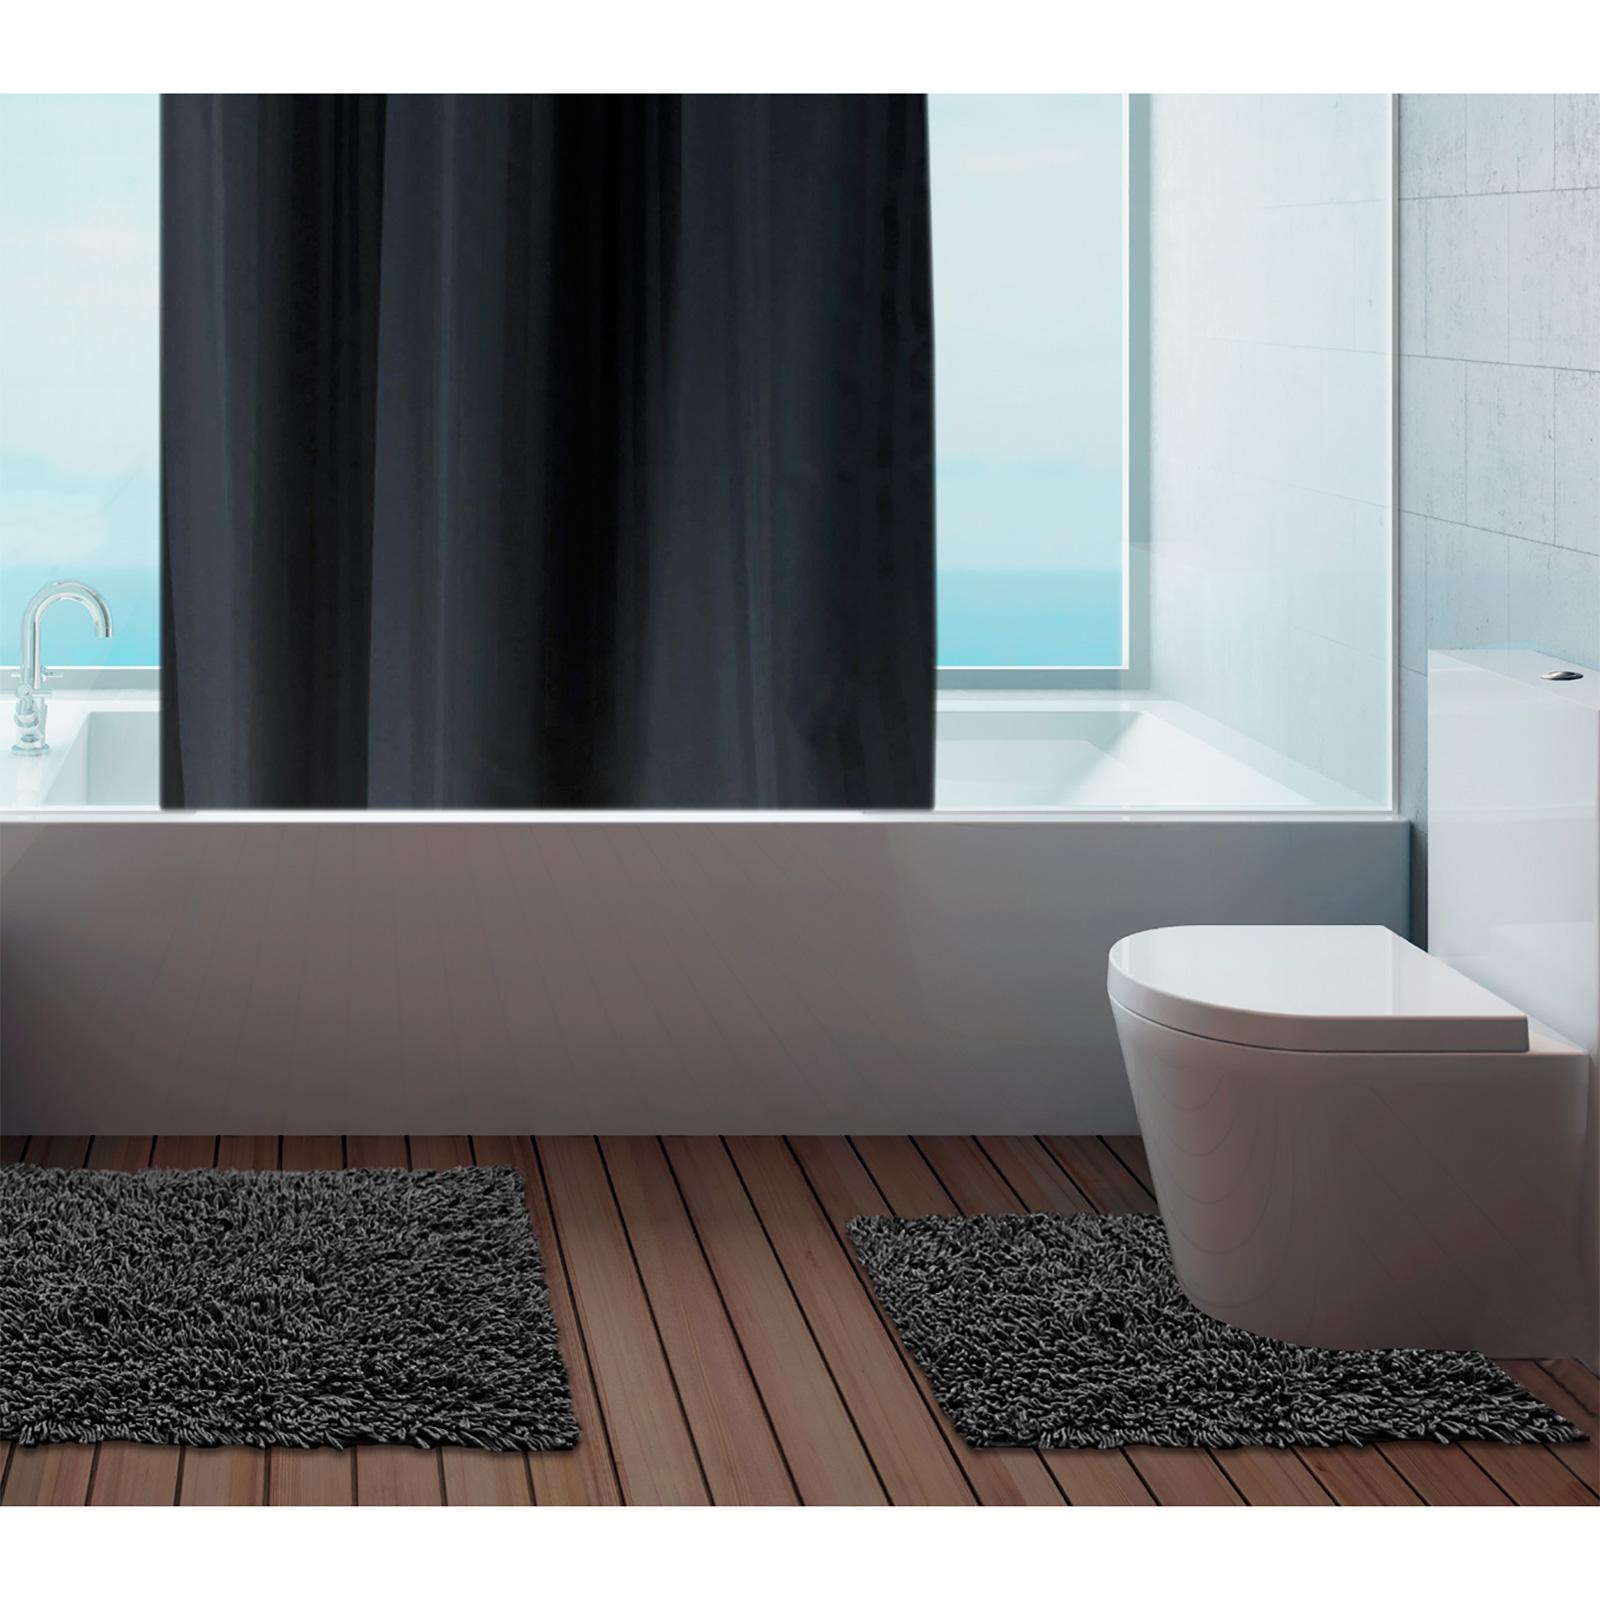 Interior bathroom bathroom mats set - 100 Cotton Bathroom Mats Set Washable Bath Amp